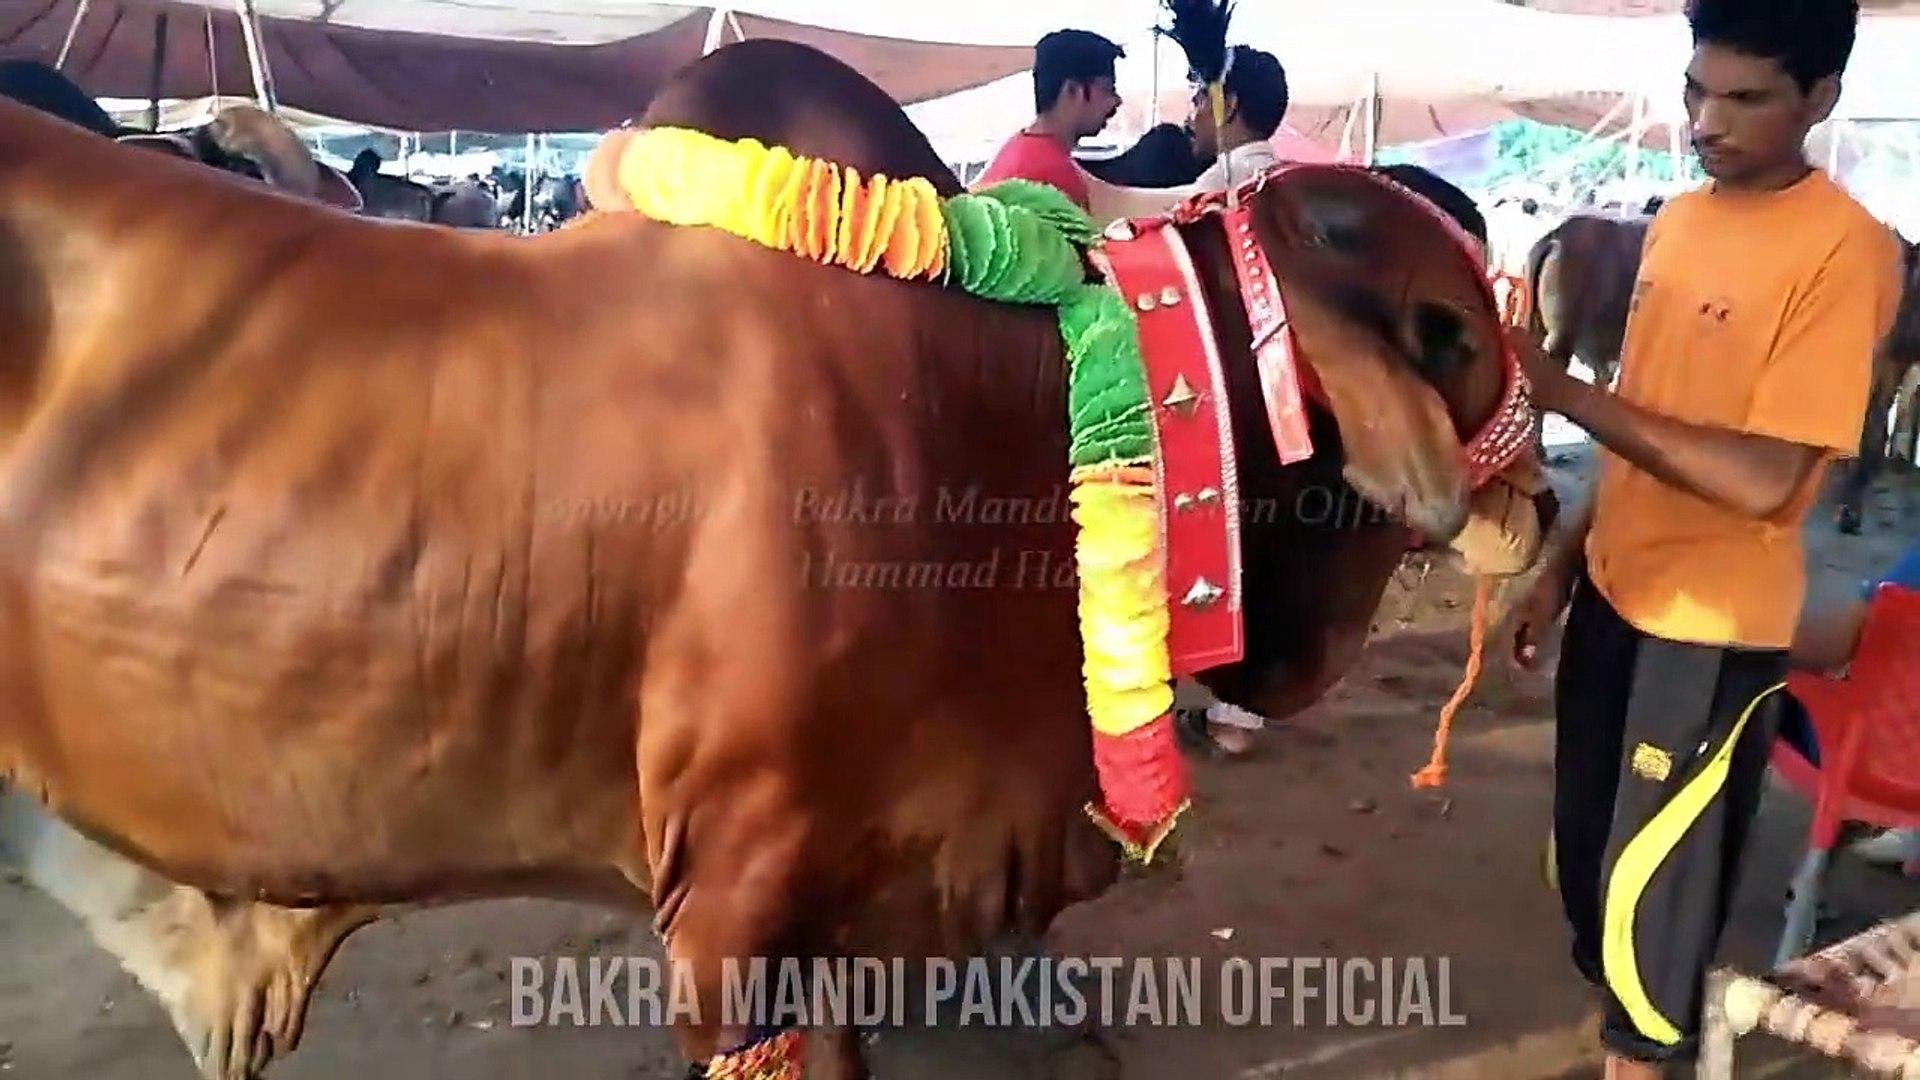 Lahore Cow and Bakra Mandi ki Heavy Beauties - Episode 1 - BakraEid in  Pakistan - Eid Ul Adha 2017